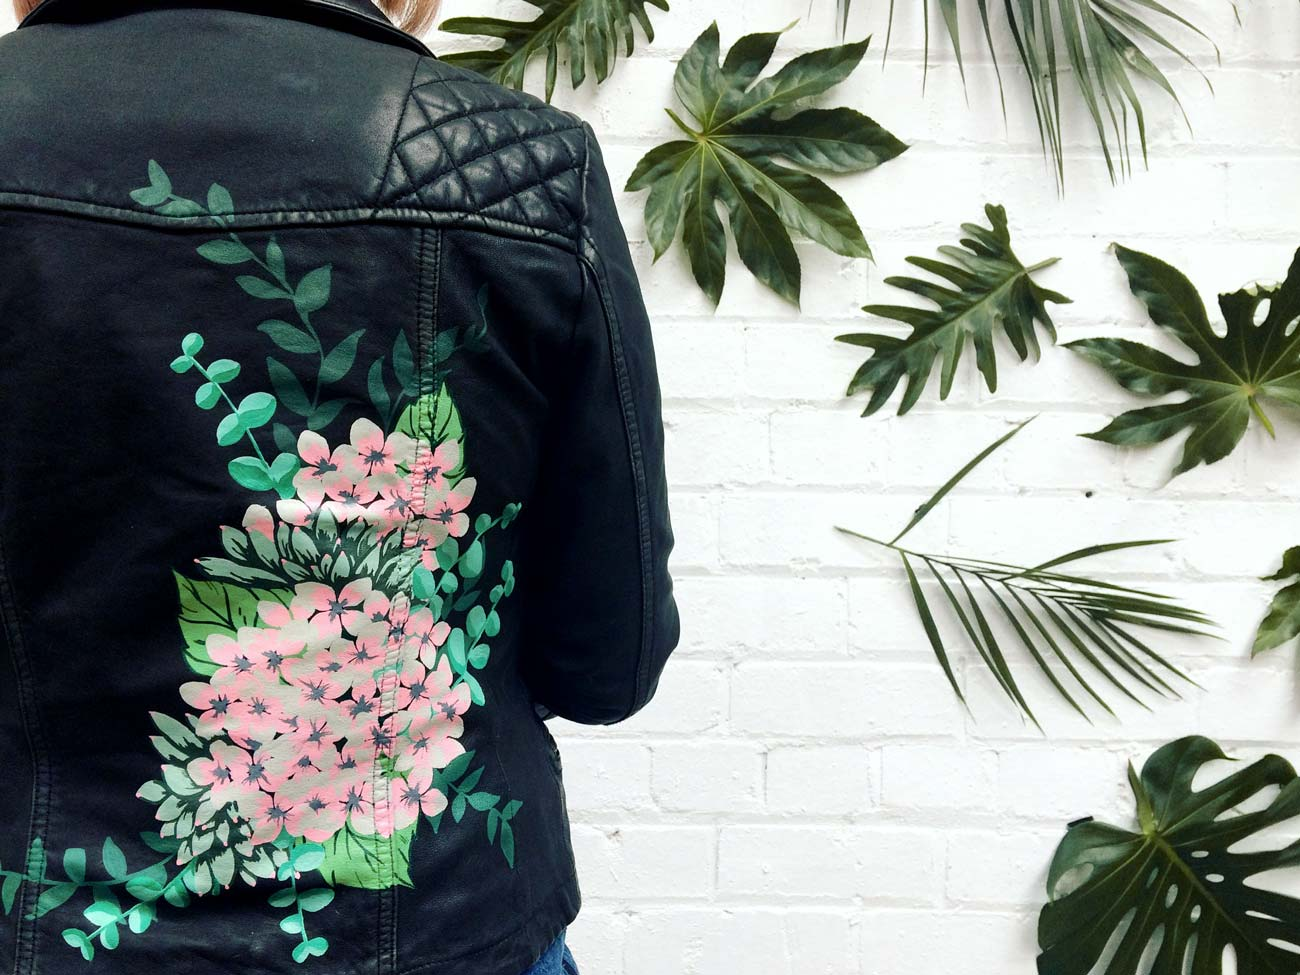 Leather-Jacket-1-web.jpg